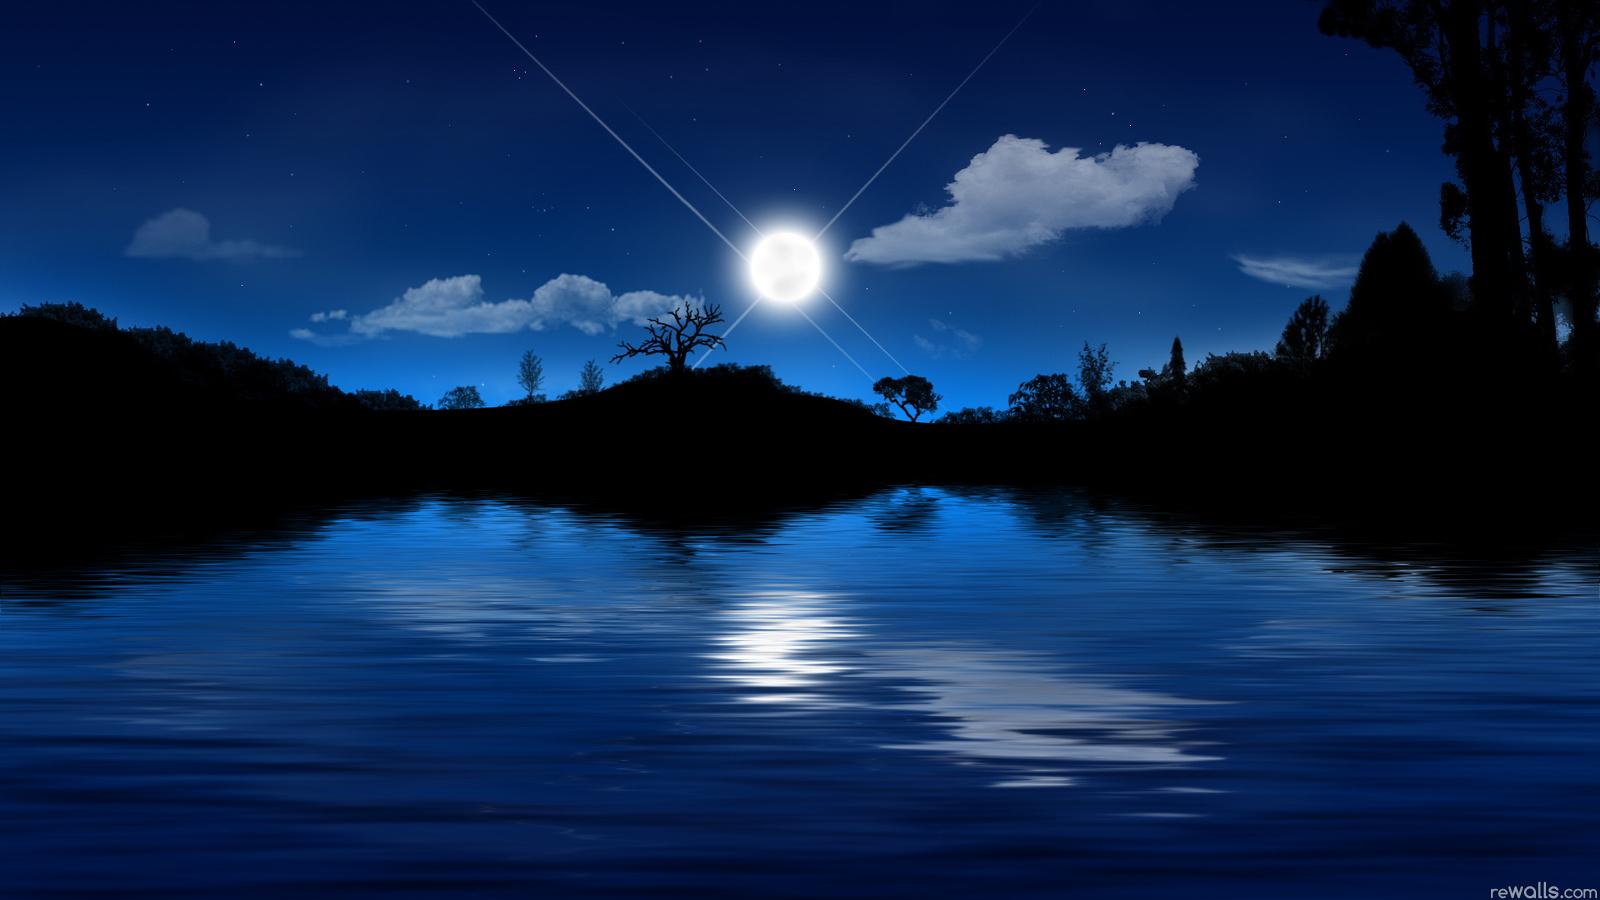 http://2.bp.blogspot.com/-ESNT3sZycCM/TfM95t2qgFI/AAAAAAAACAY/BV1ztRFuiwY/s1600/HD_Nature_Wallpaper_moon_love.jpg